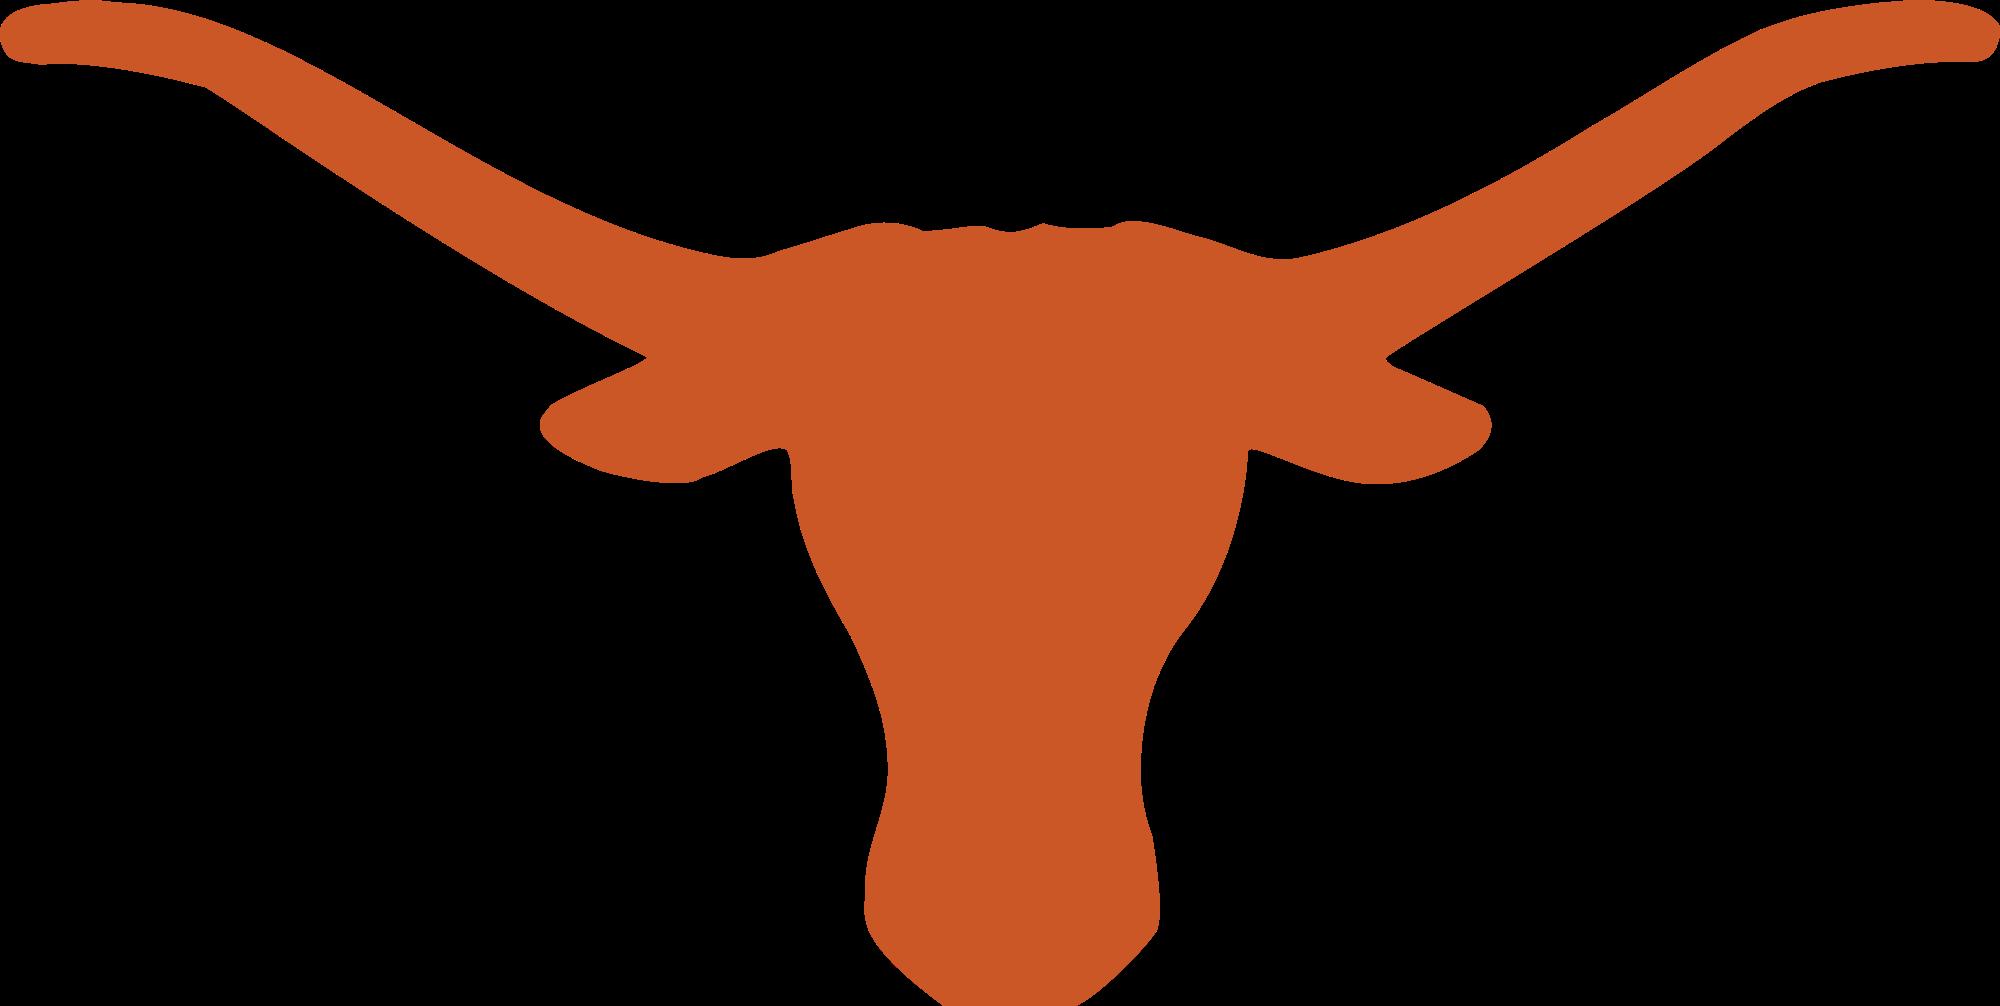 Oklahoma football clipart banner freeuse Hook 'em Horns!